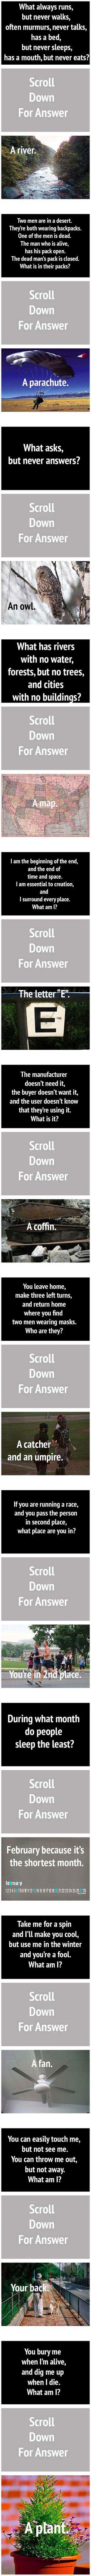 12 epic riddles.